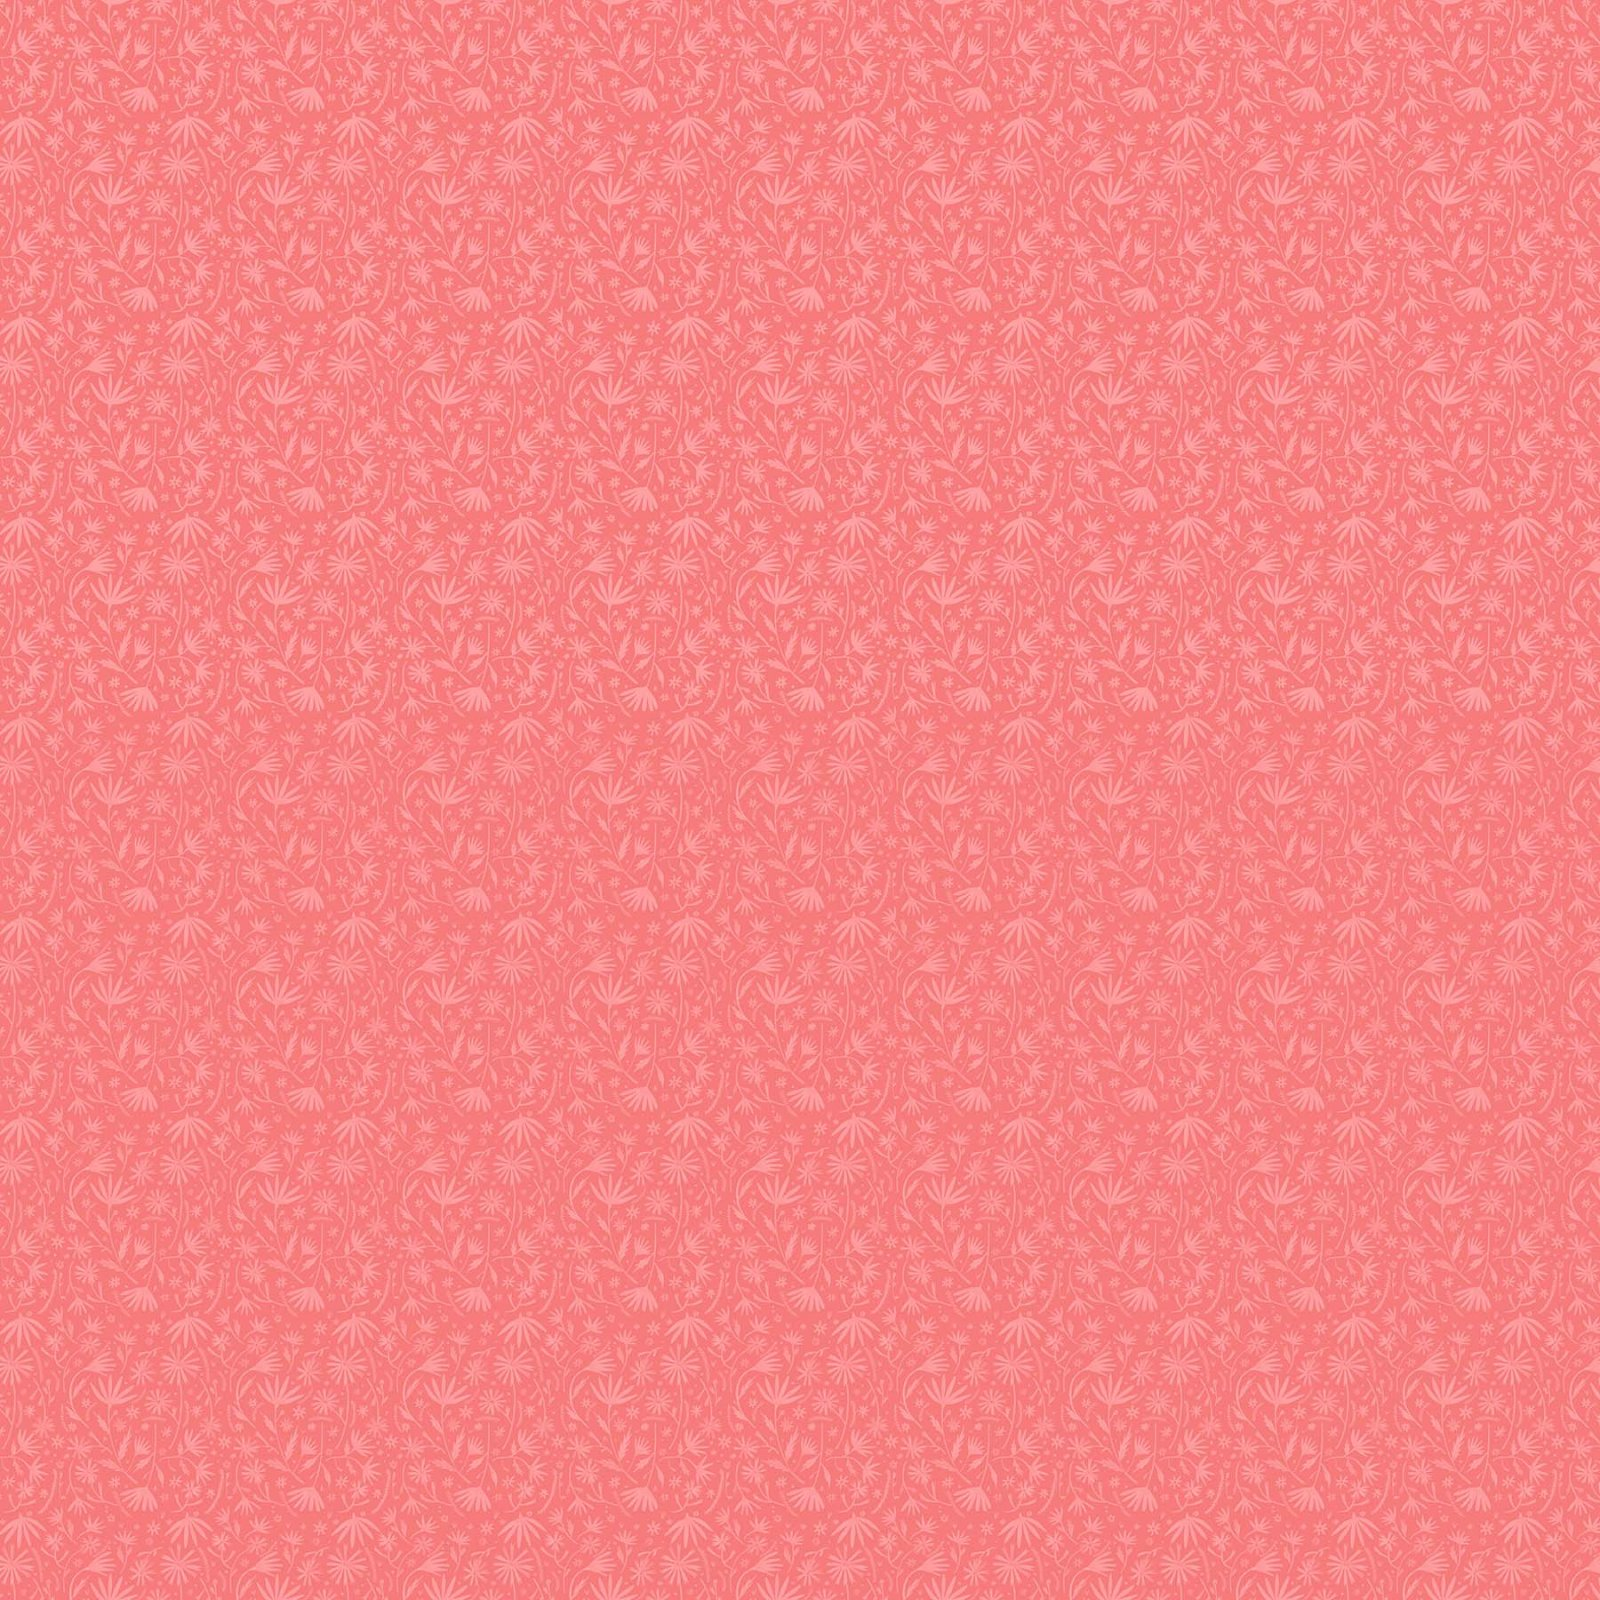 90035/22 Coral: Eloise's Garden (Abigail Halpin)